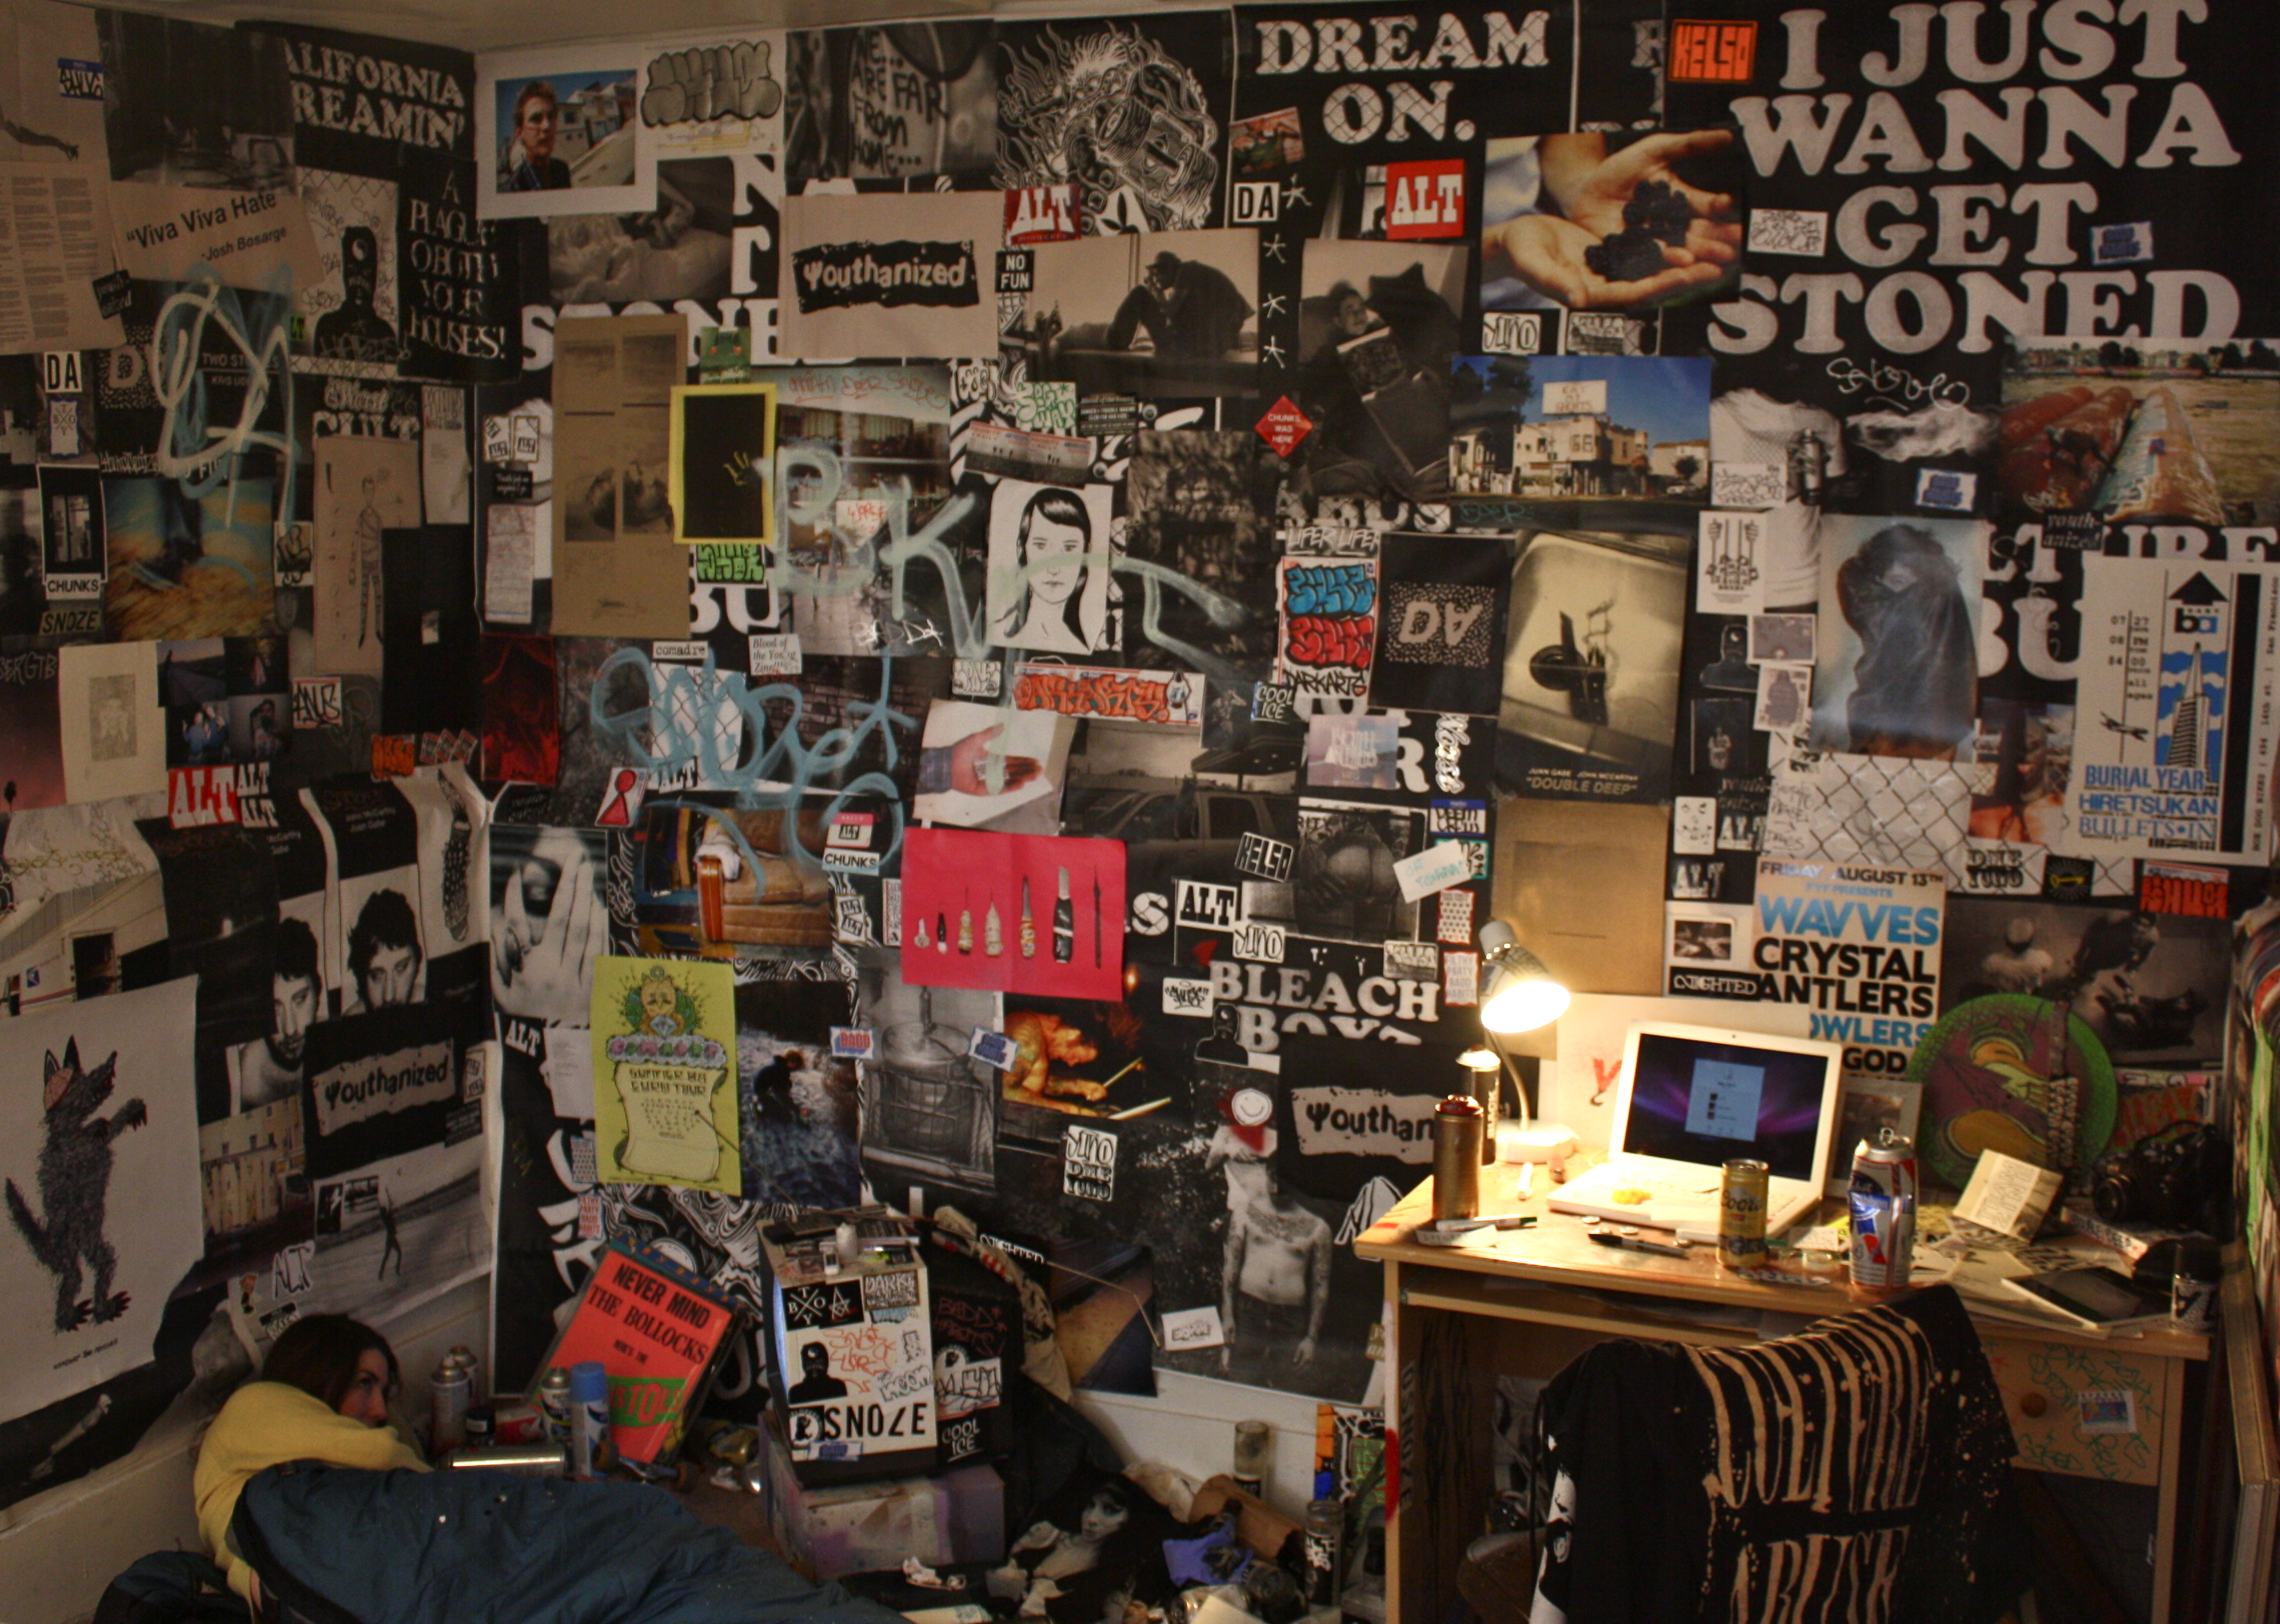 20 Punk Rock Bedroom Ideas Home Design And Interior. Images of 20 Punk Rock Bedroom    SC